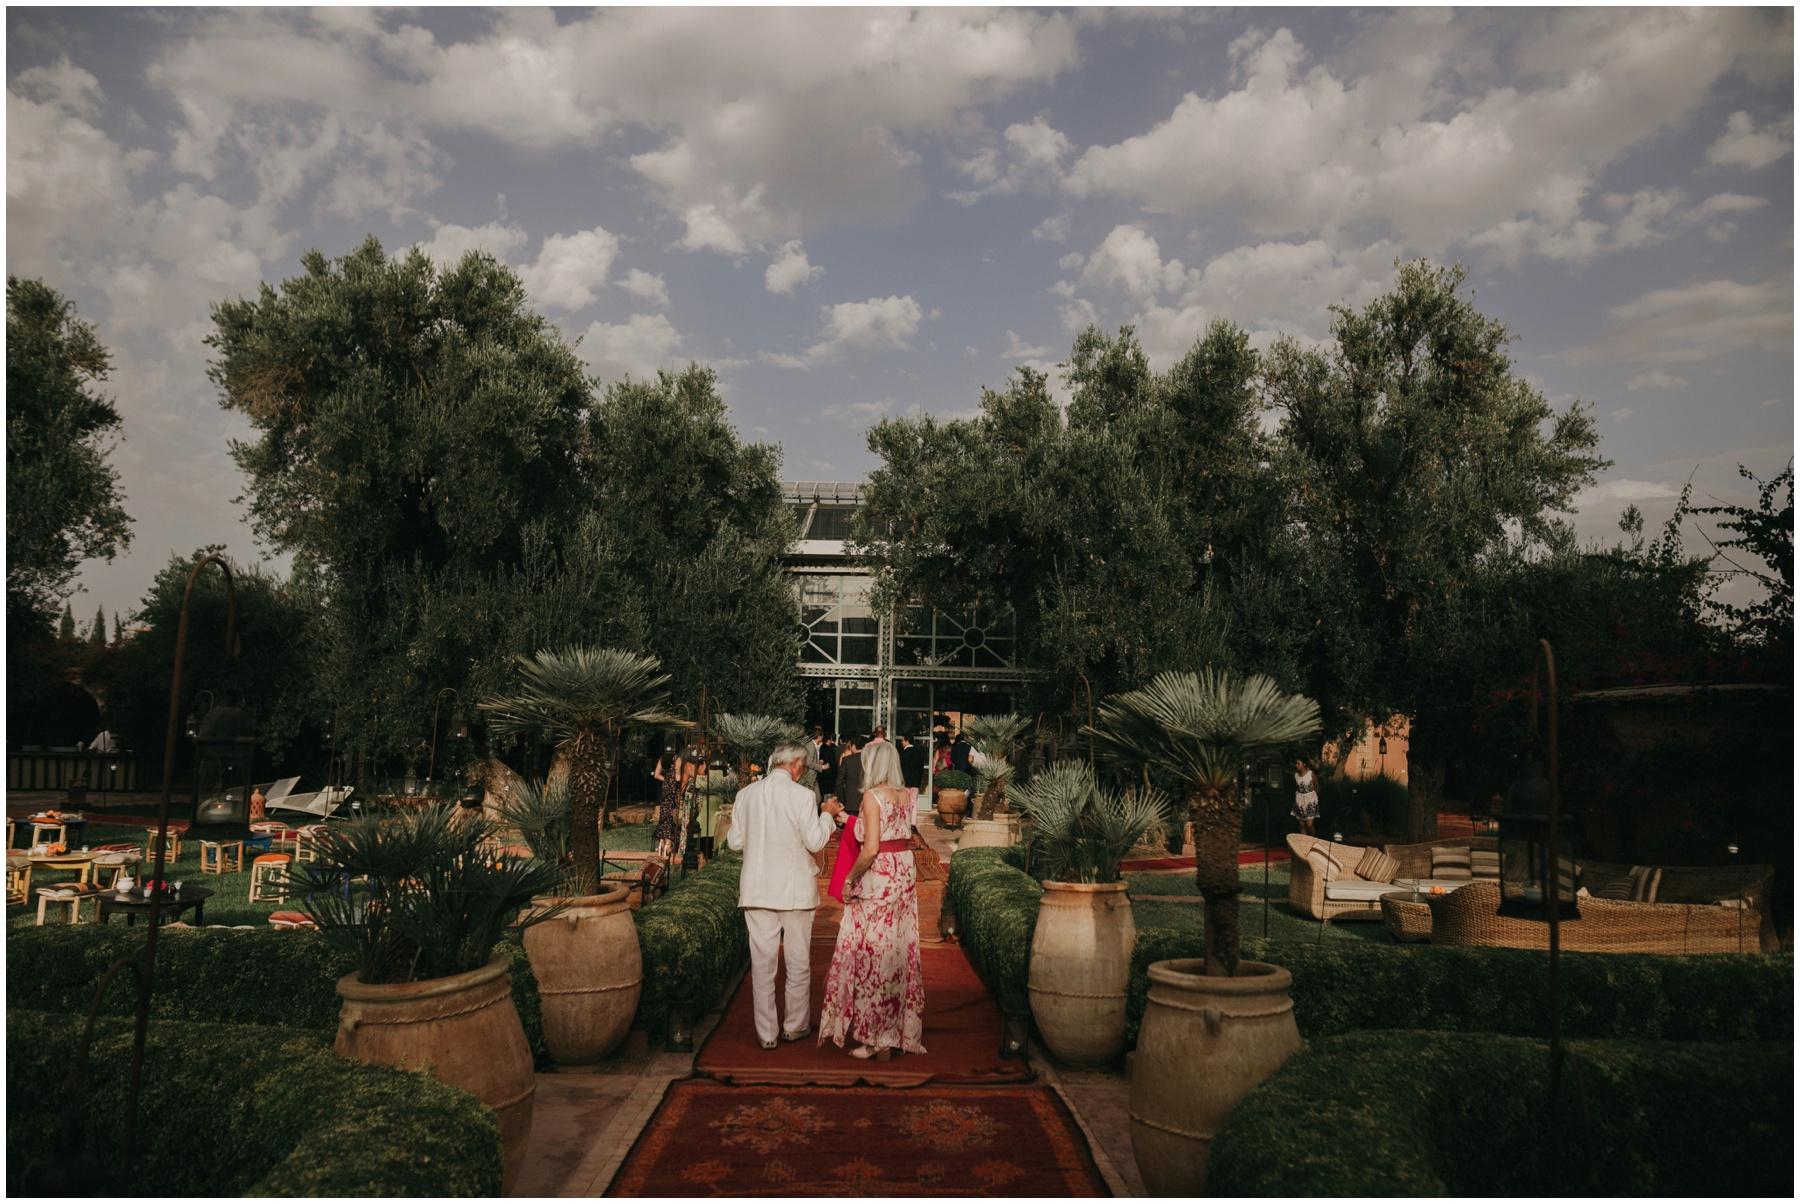 Marrakech Wedding Beldi Coutry Club 027.JPG